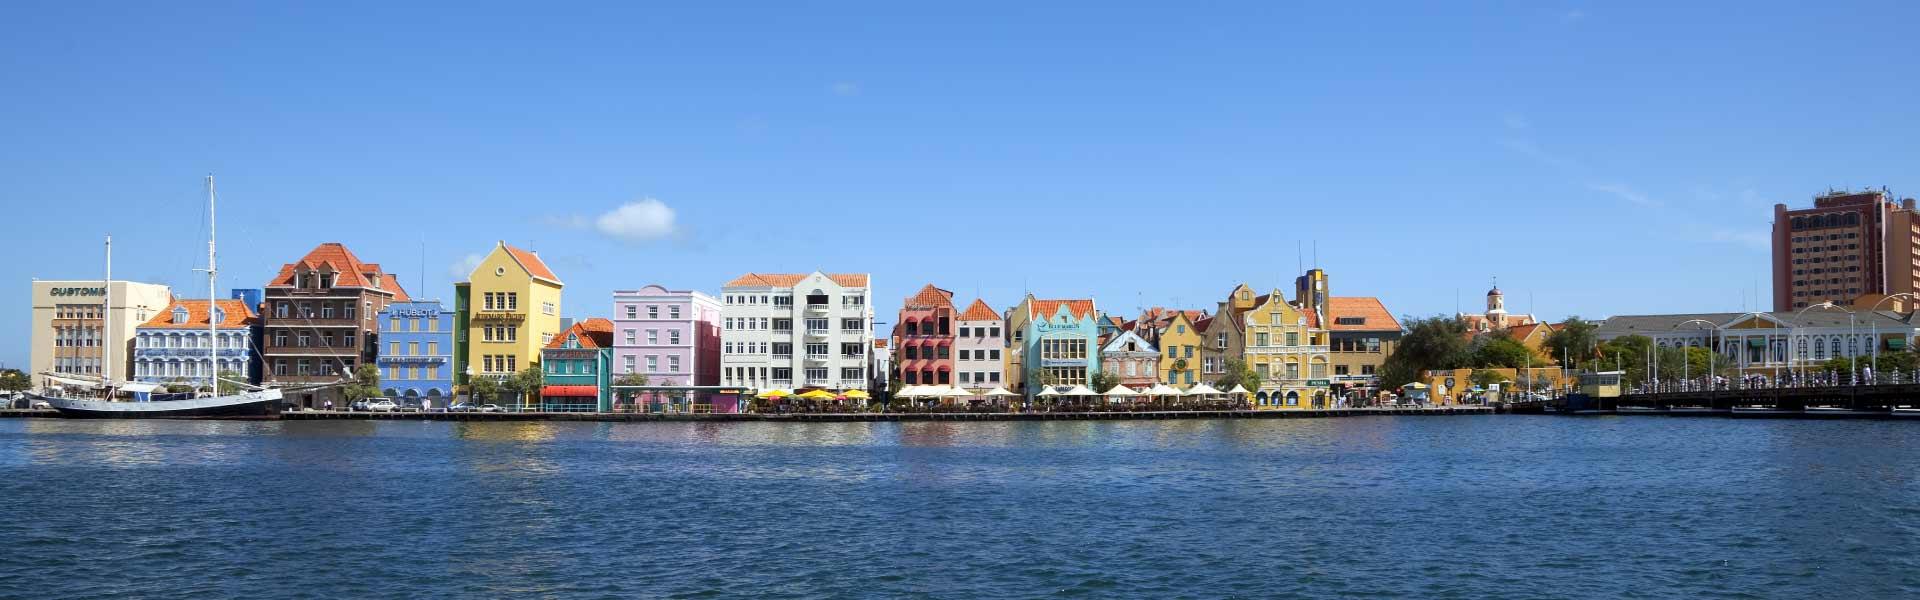 Arquitectura colonial de Willemstad